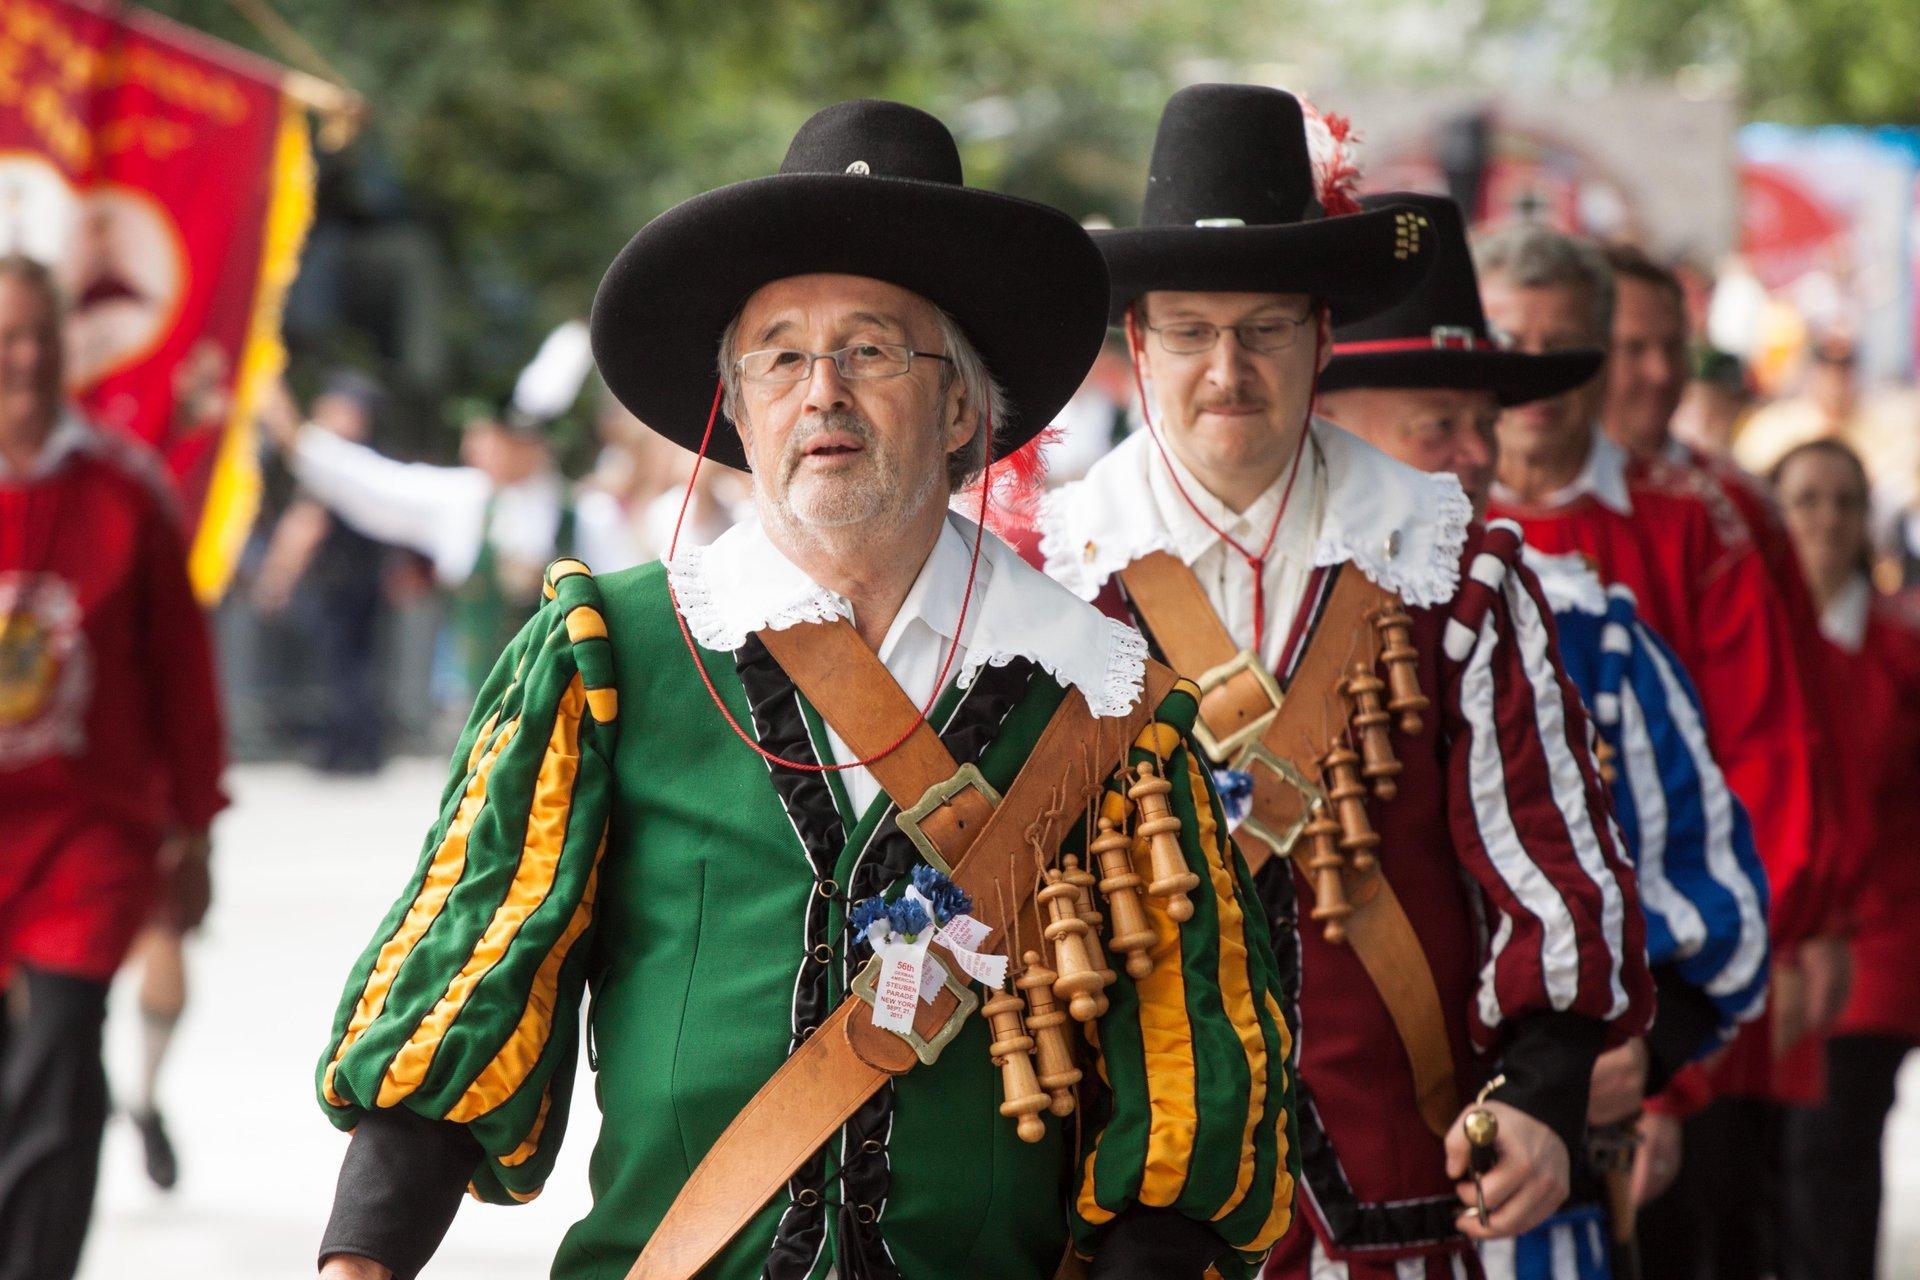 German-American Steuben Parade in New York - Best Season 2020